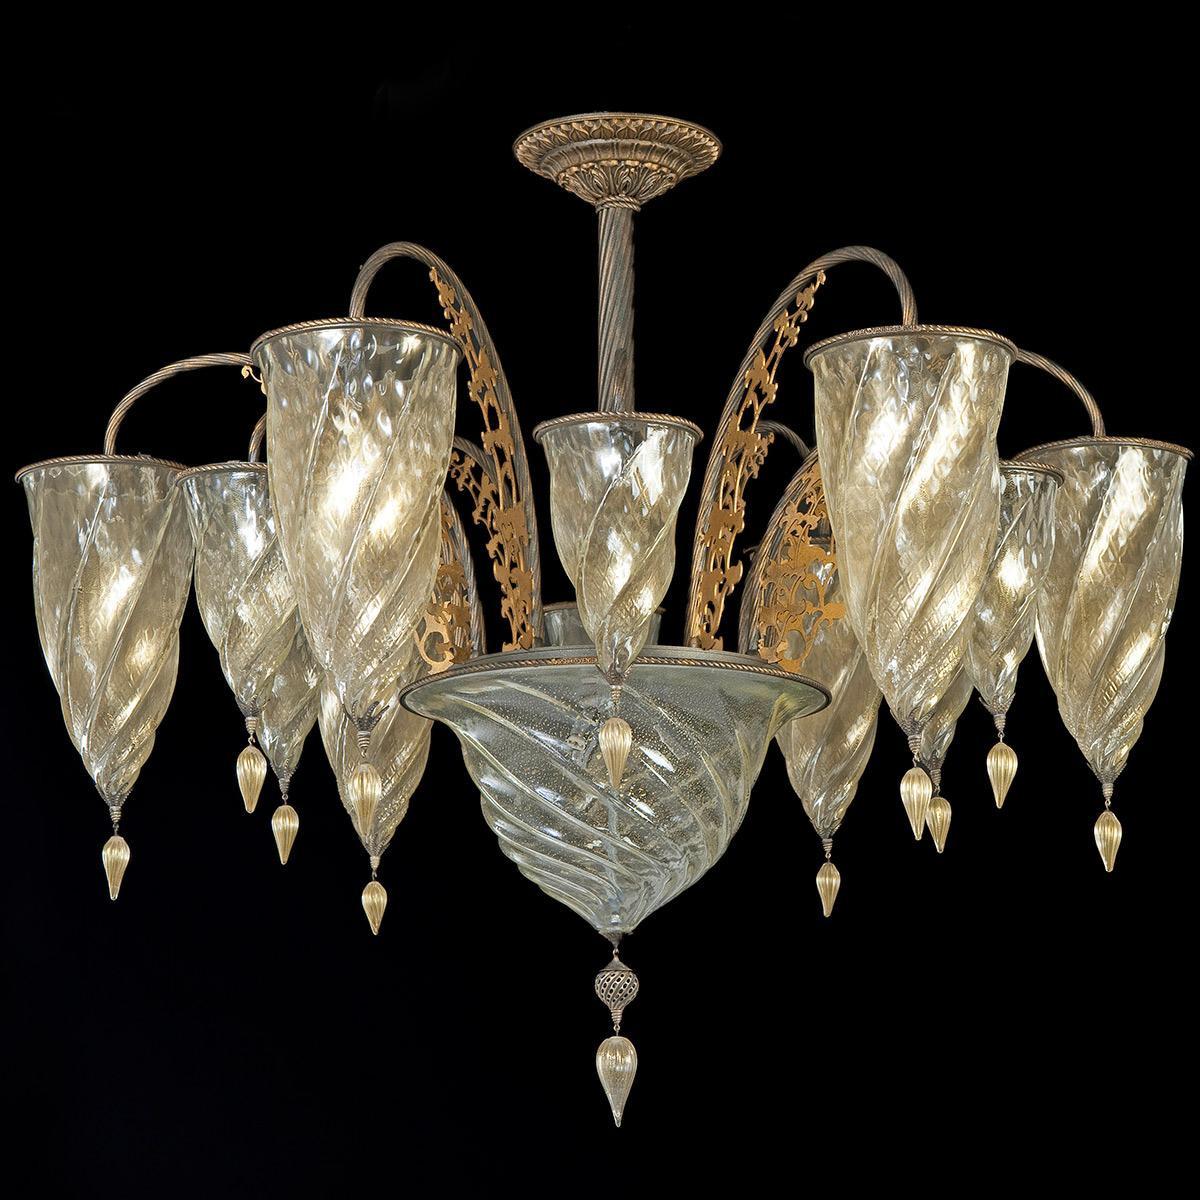 """Medina"" lustre en cristal de Murano - 13 lumières - or"